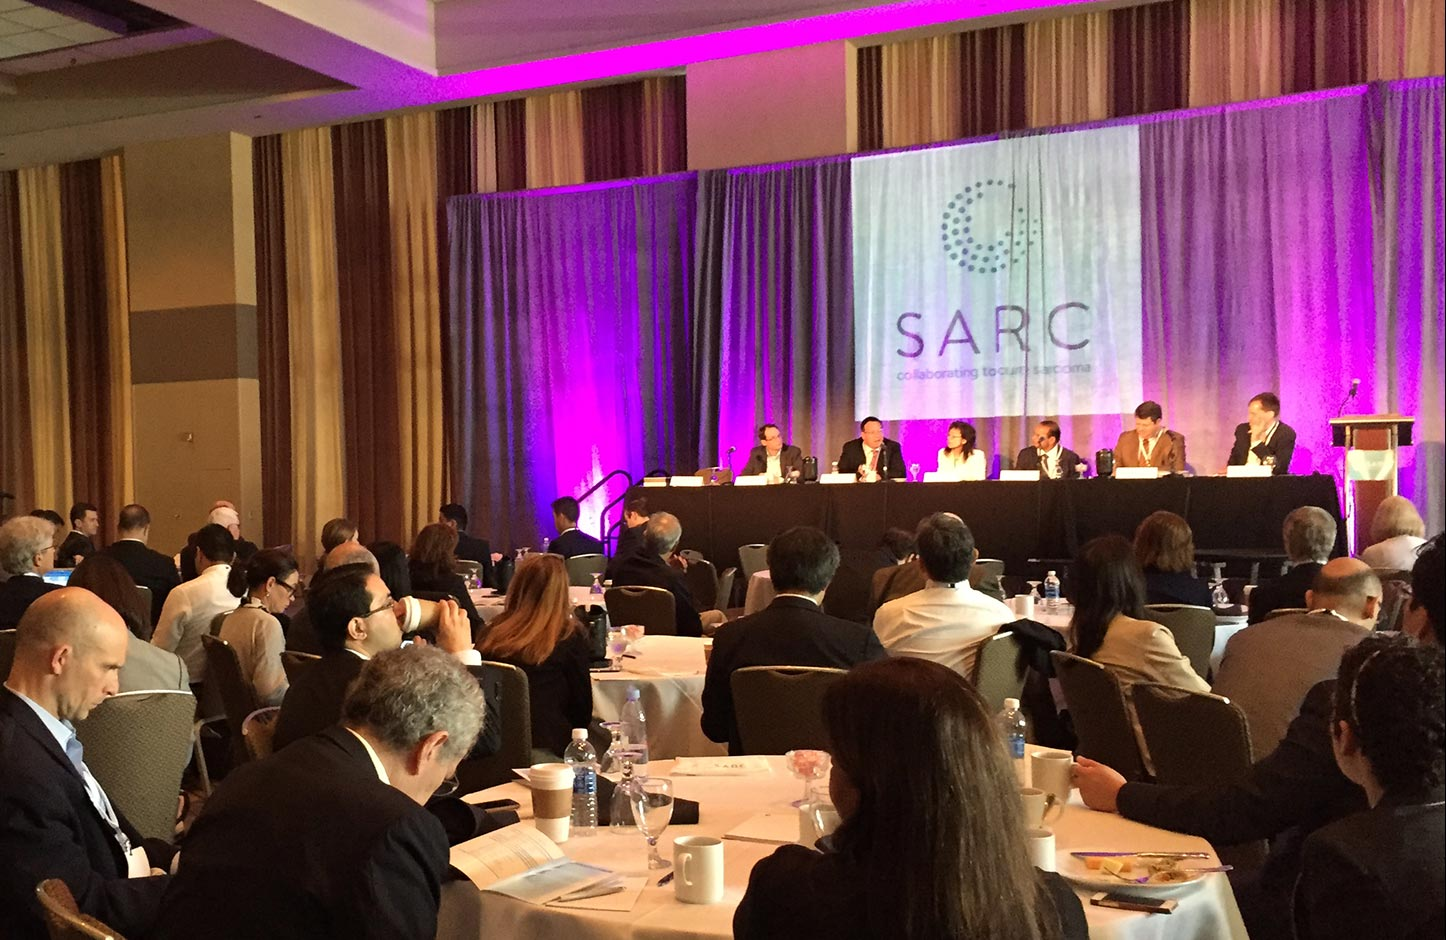 SARC semi-annual meeting 2016